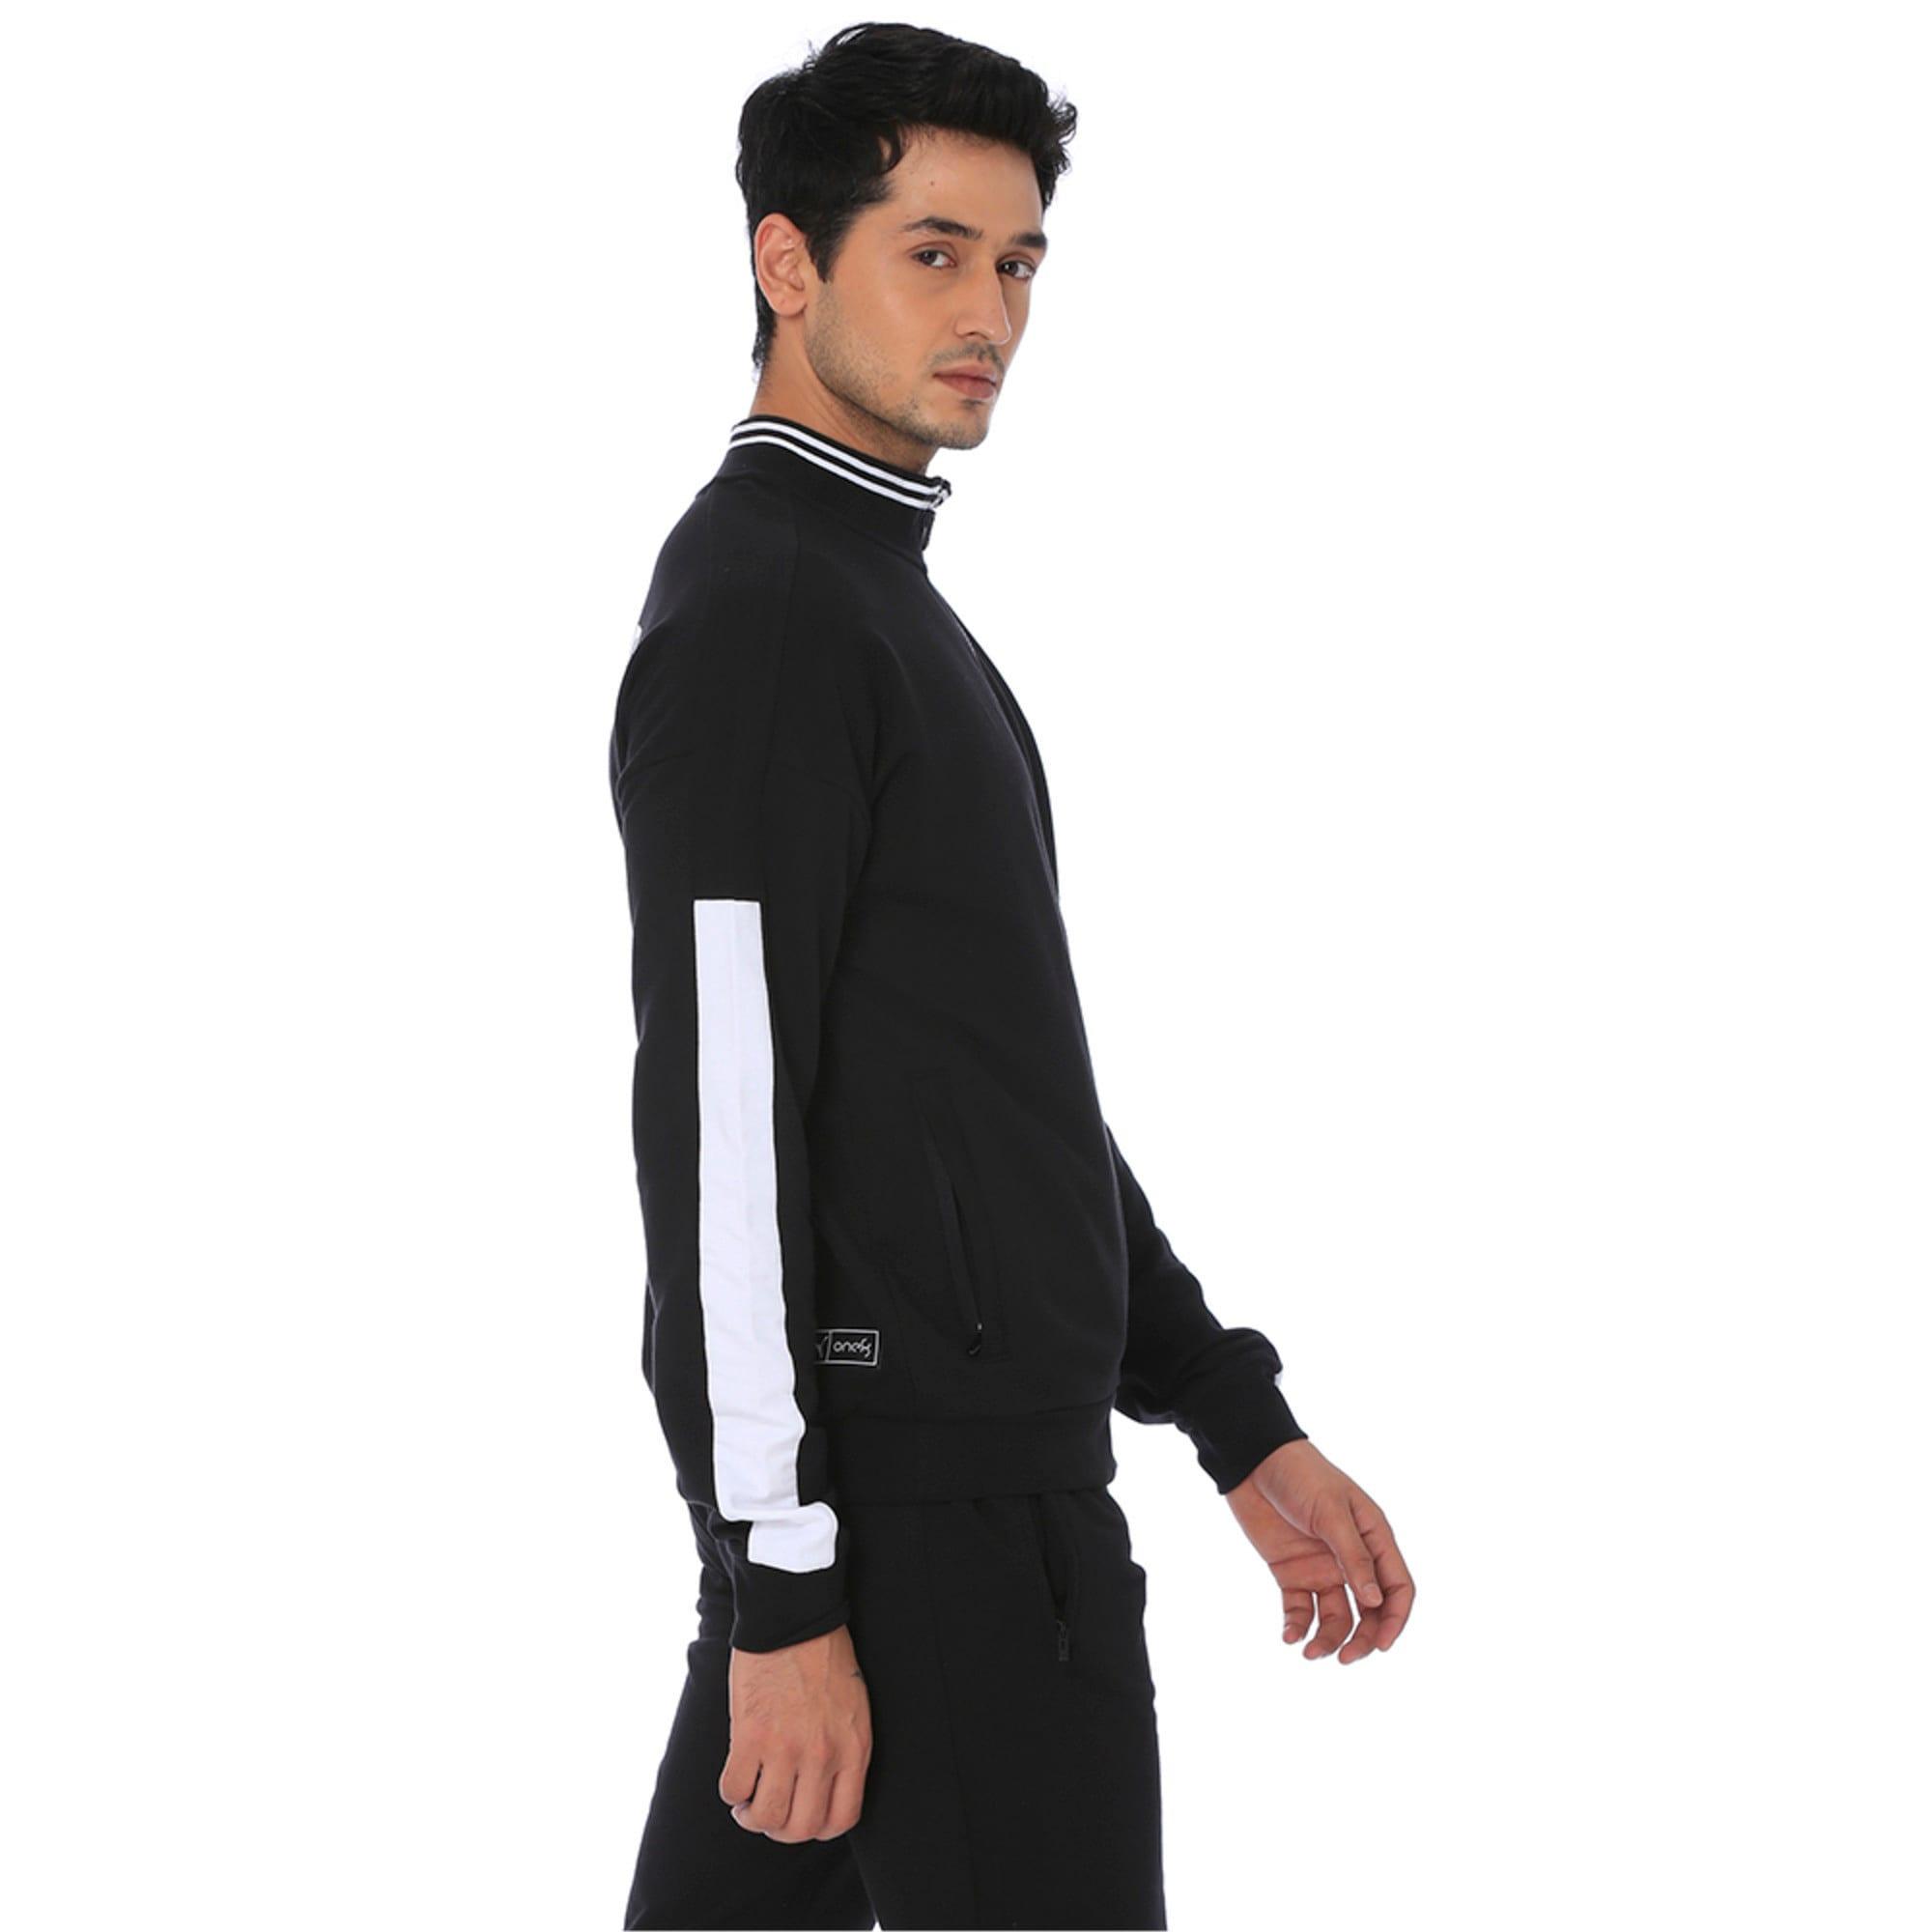 Thumbnail 2 of one8 Men's Knitted Track Jacket, Puma Black, medium-IND